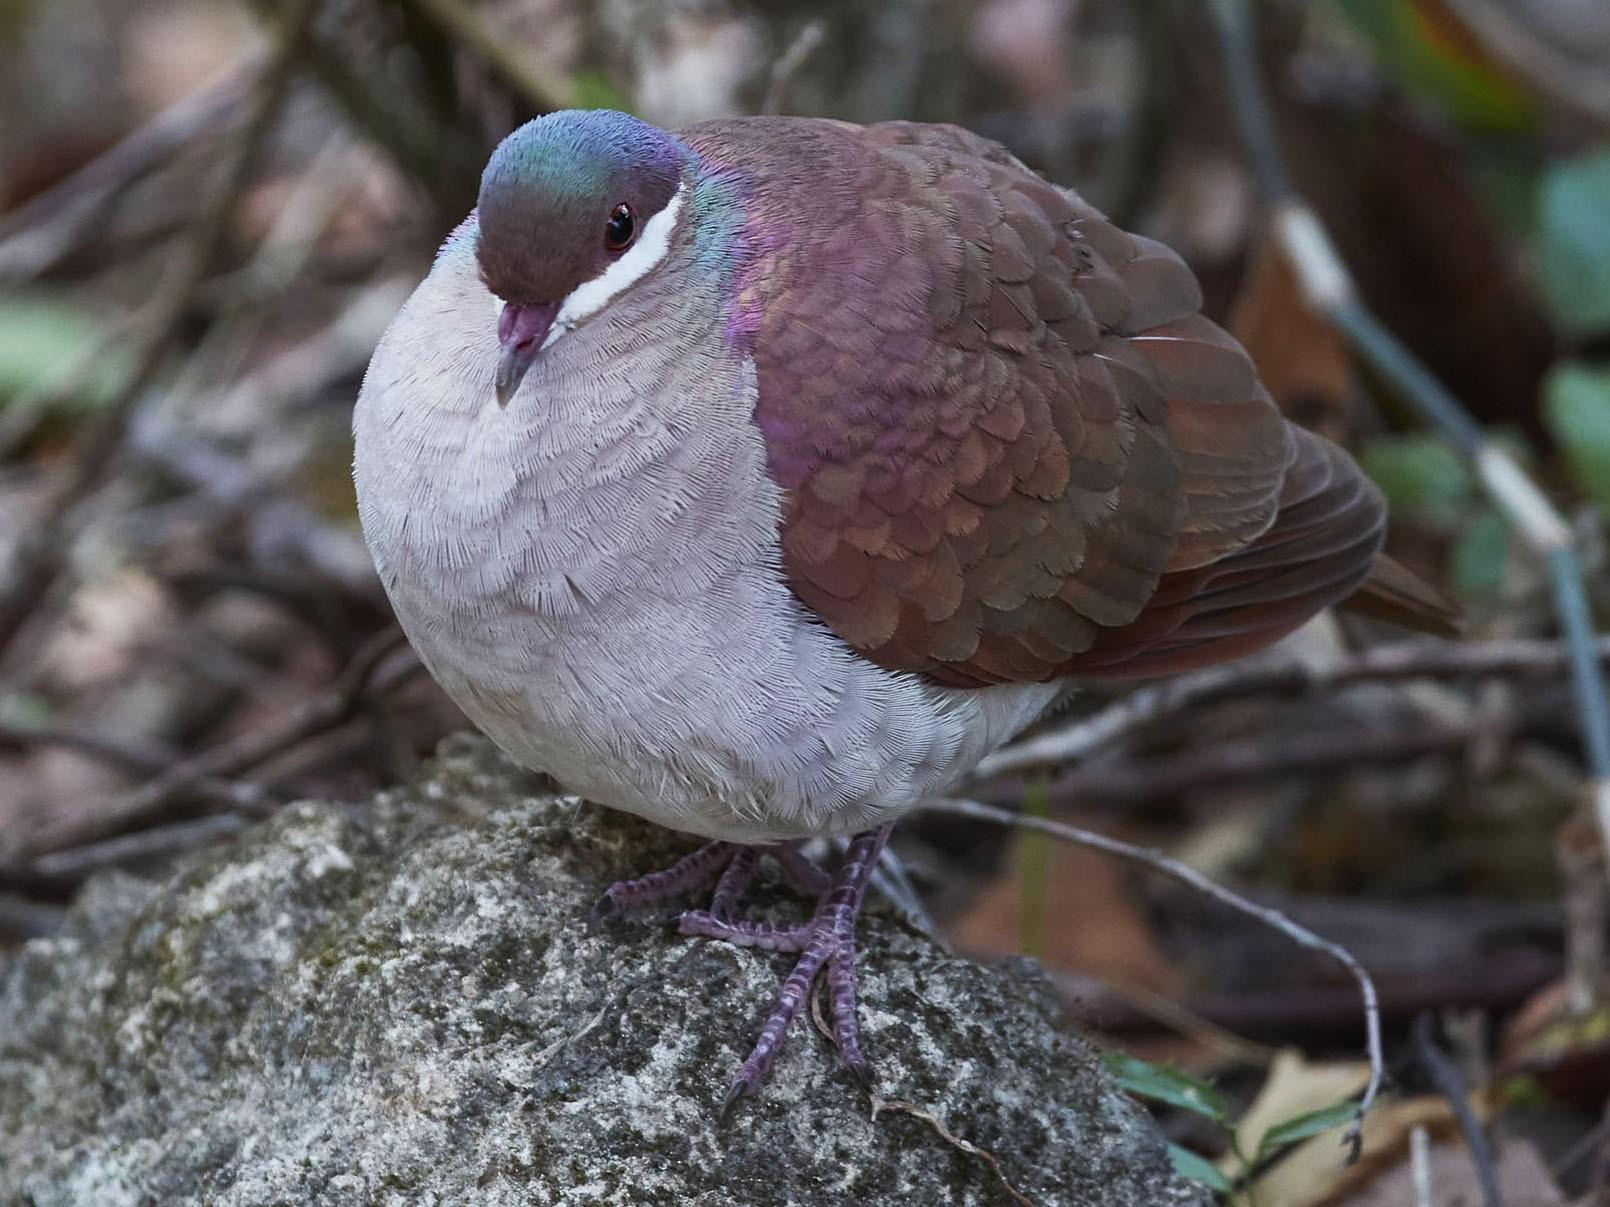 Key West Quail-Dove - Arturo Kirkconnell Jr